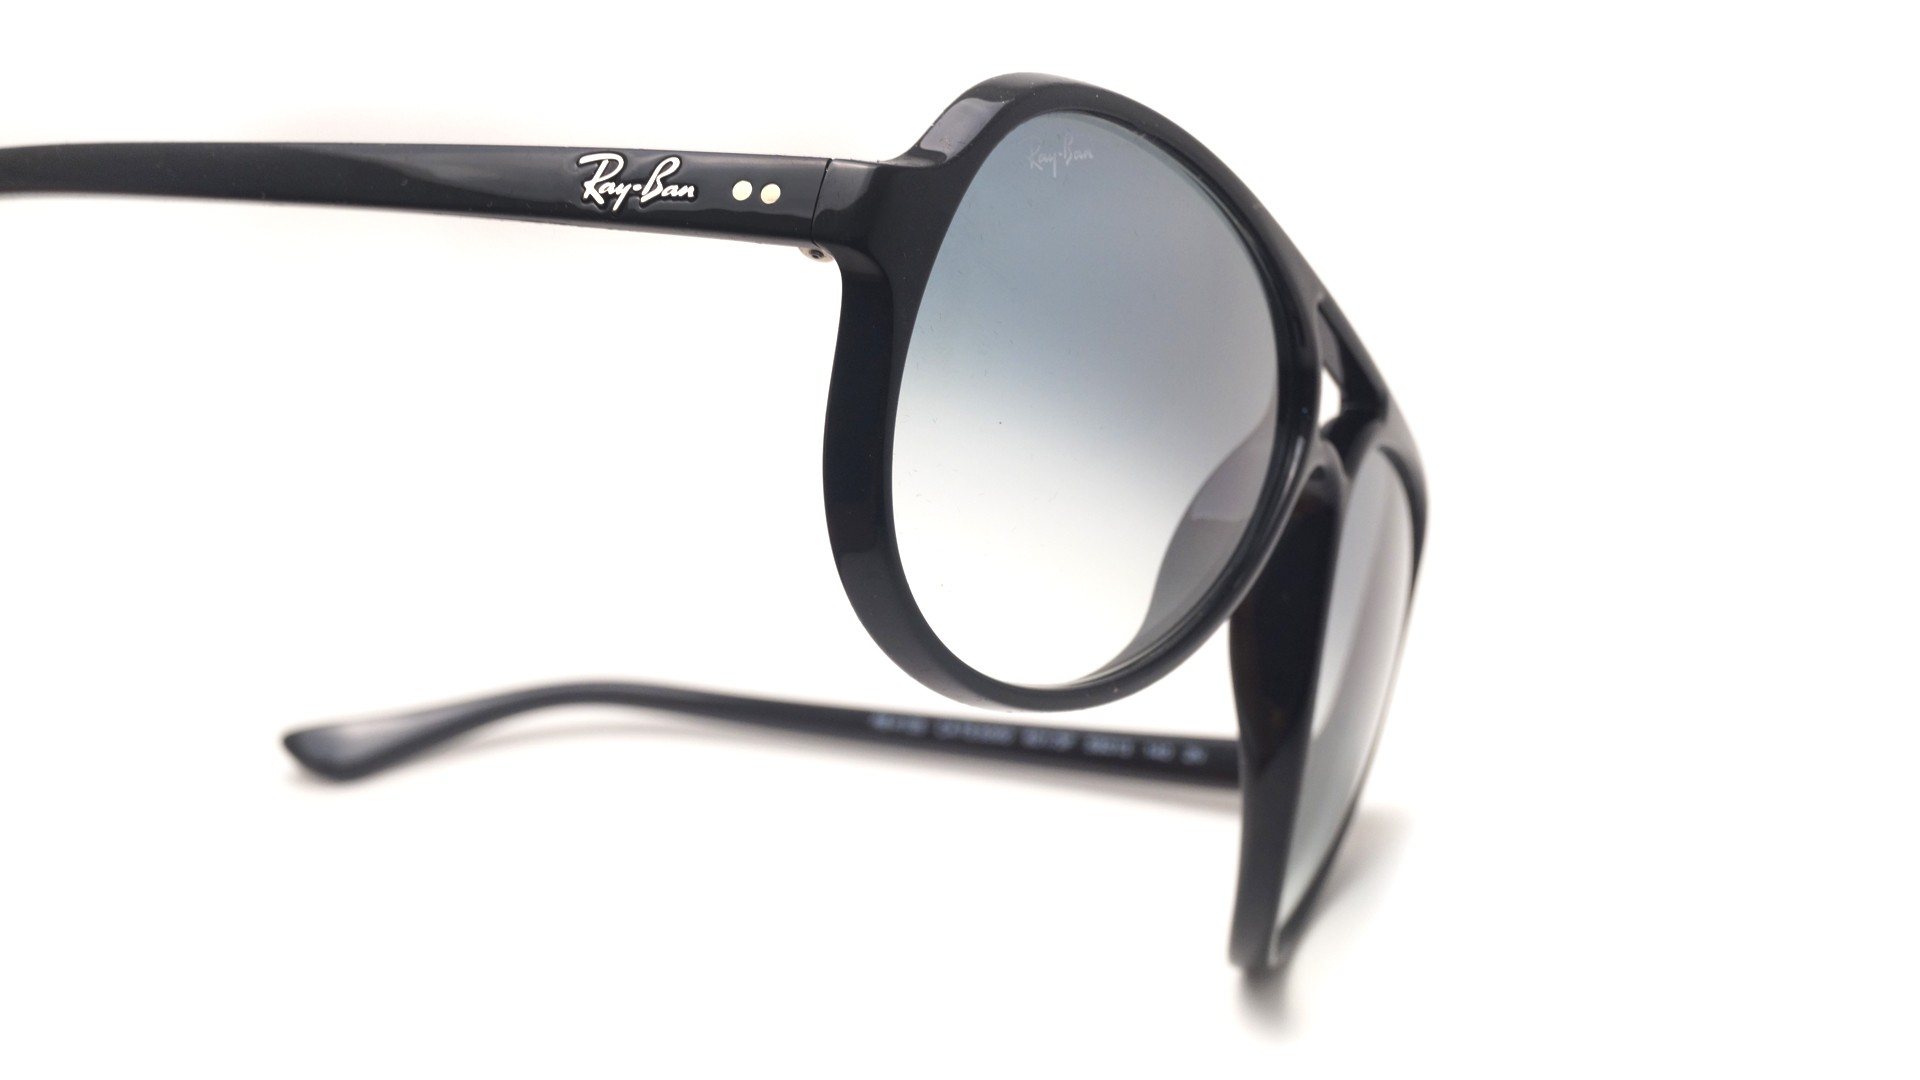 2fa6a9457193b Sunglasses Ray-Ban Cats 5000 Black RB4125 601 3F 59-13 Large Gradient